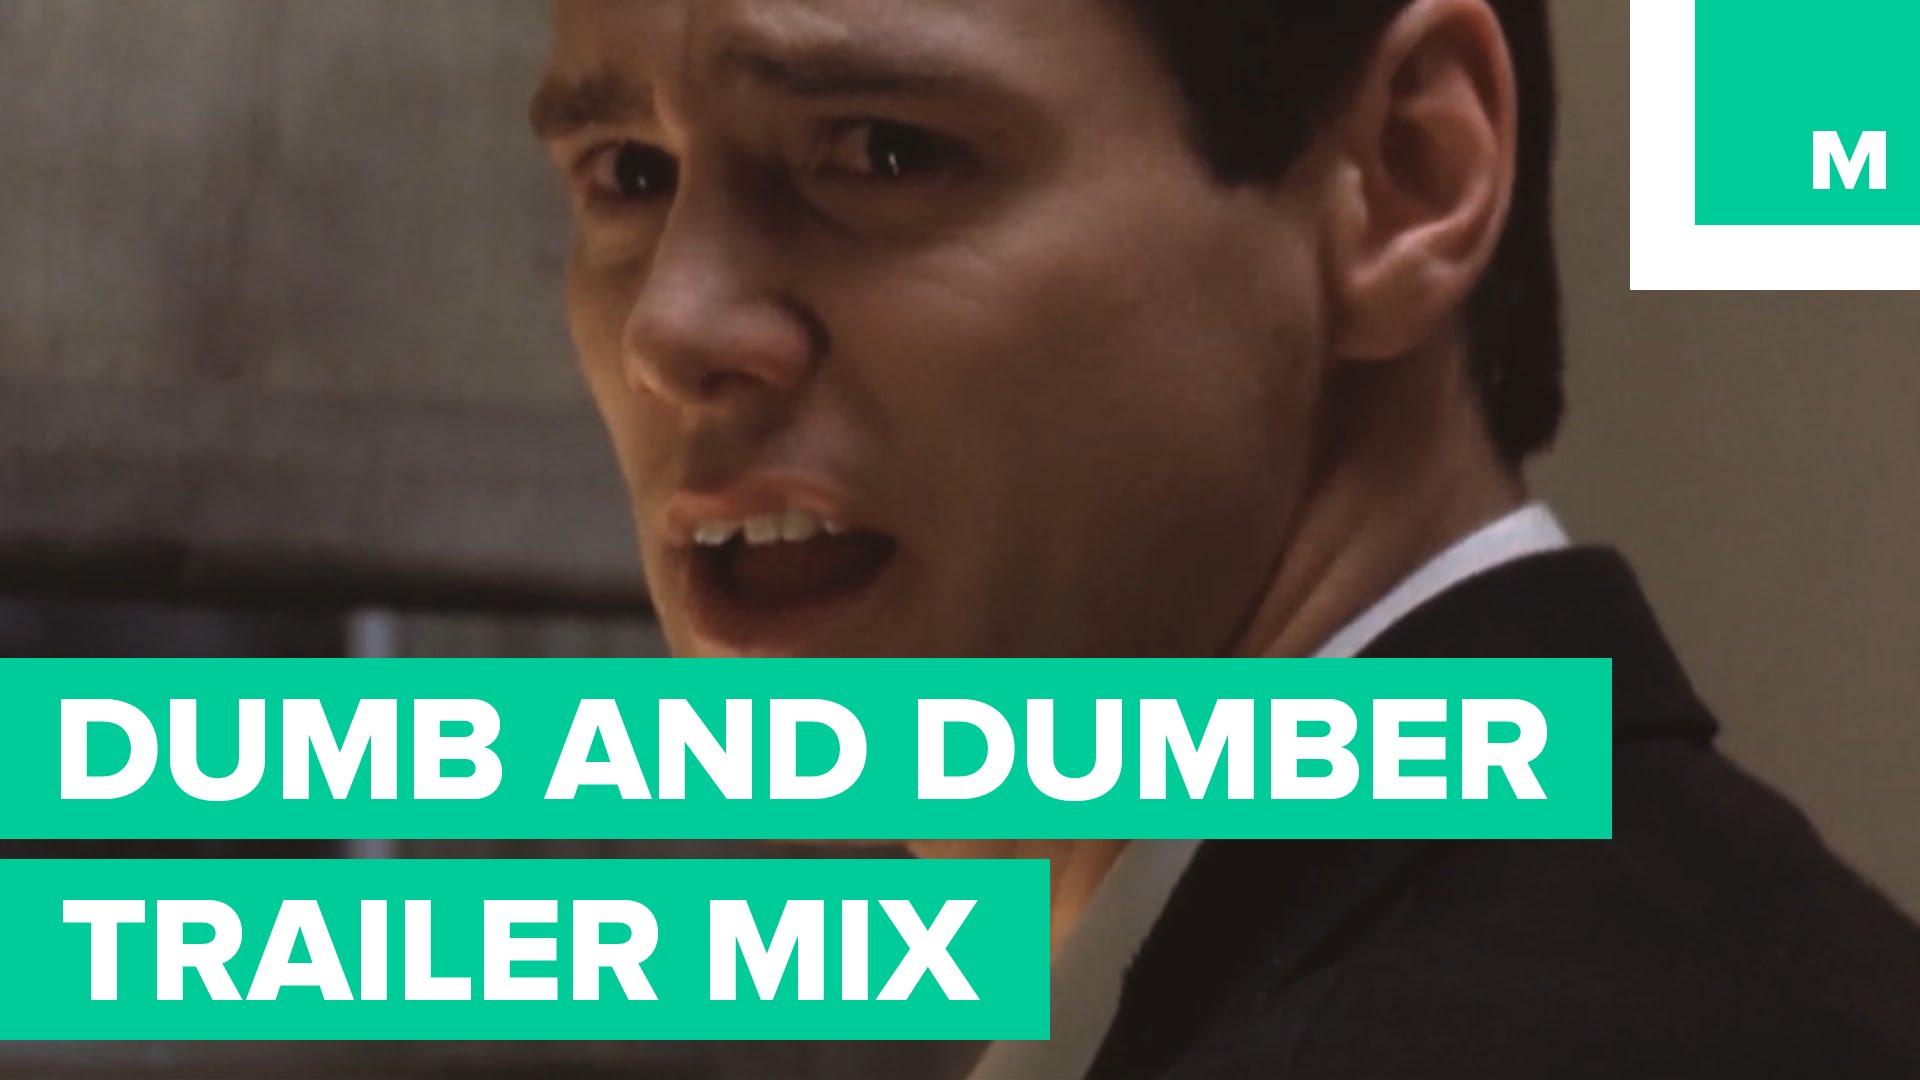 Dumb and dumber 1994 youtube